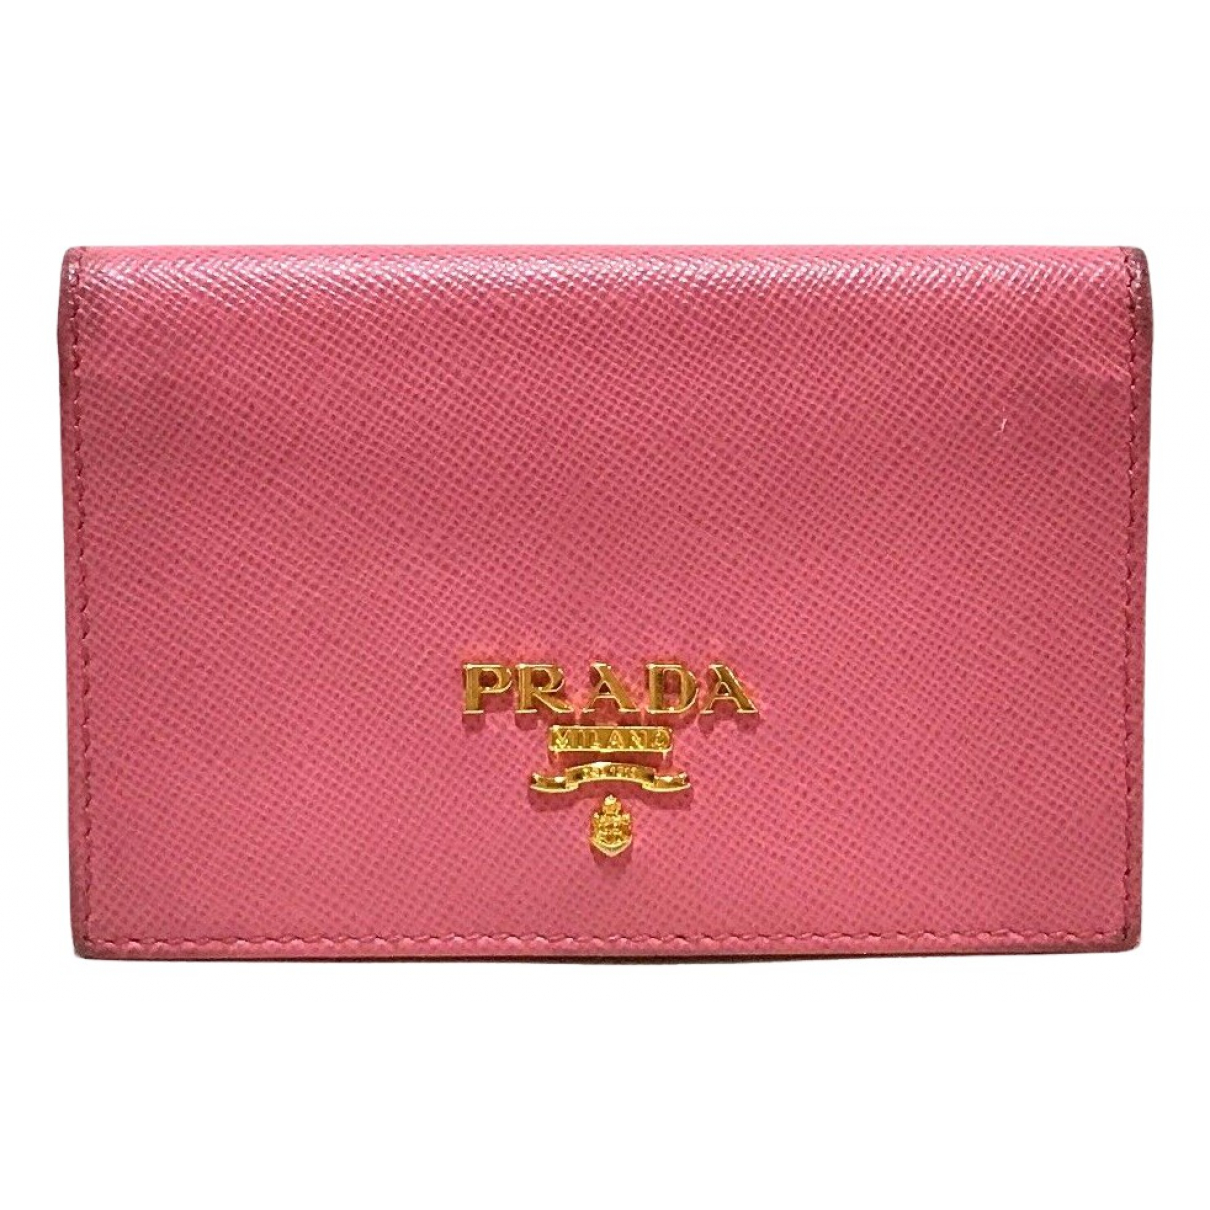 Prada - Petite maroquinerie   pour femme en cuir - rose